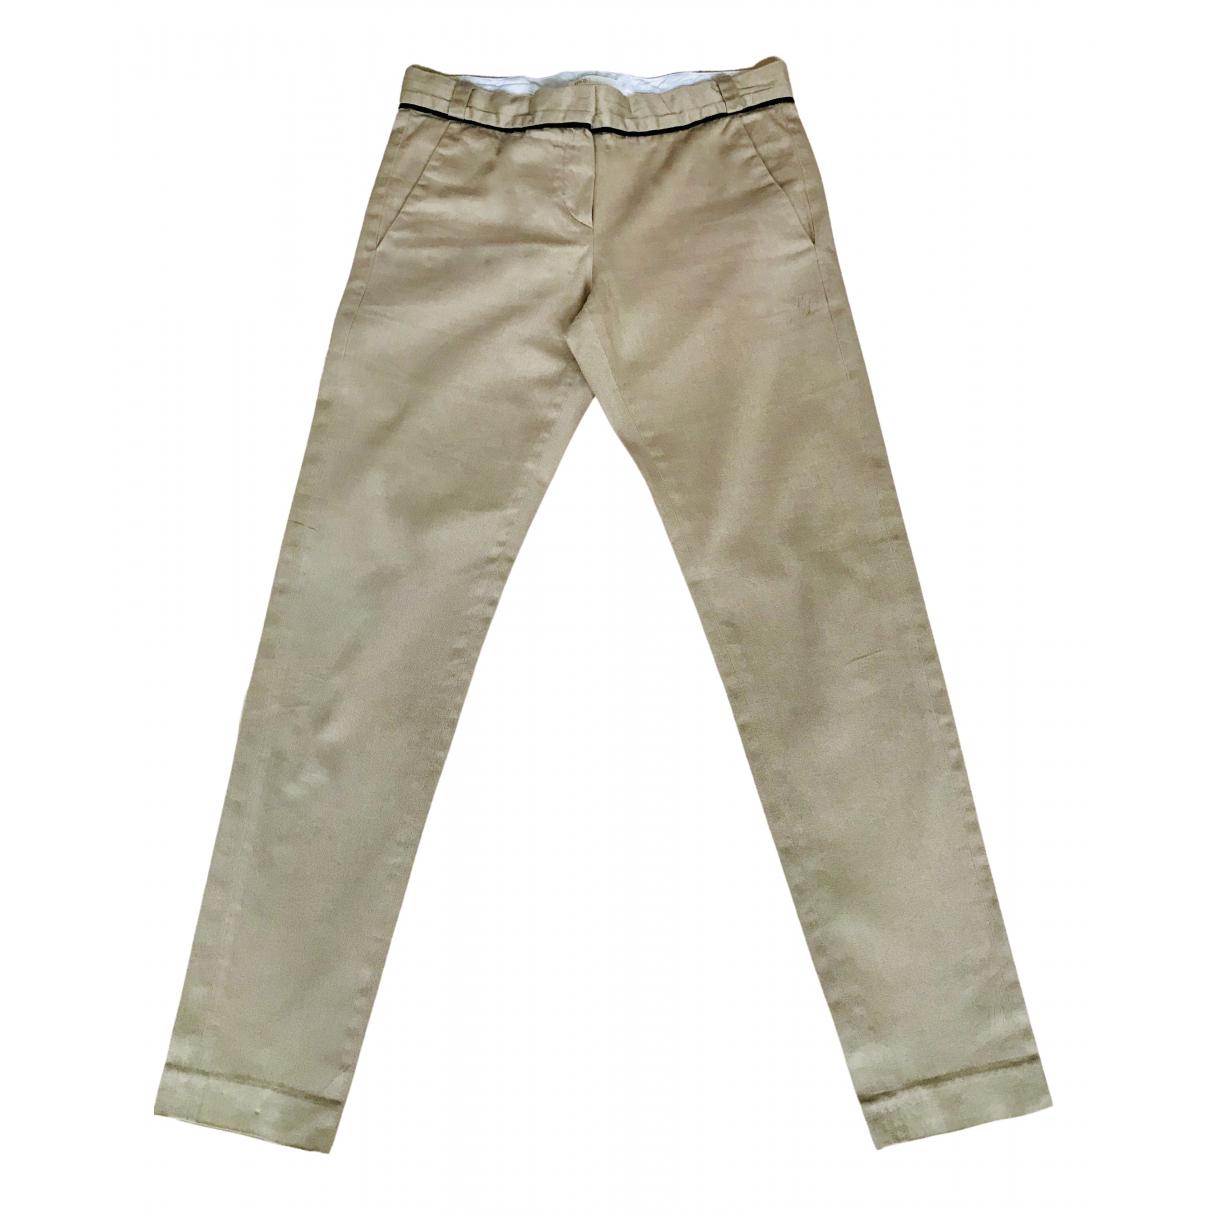 Pantalon corto Spring Summer 2019 Maje